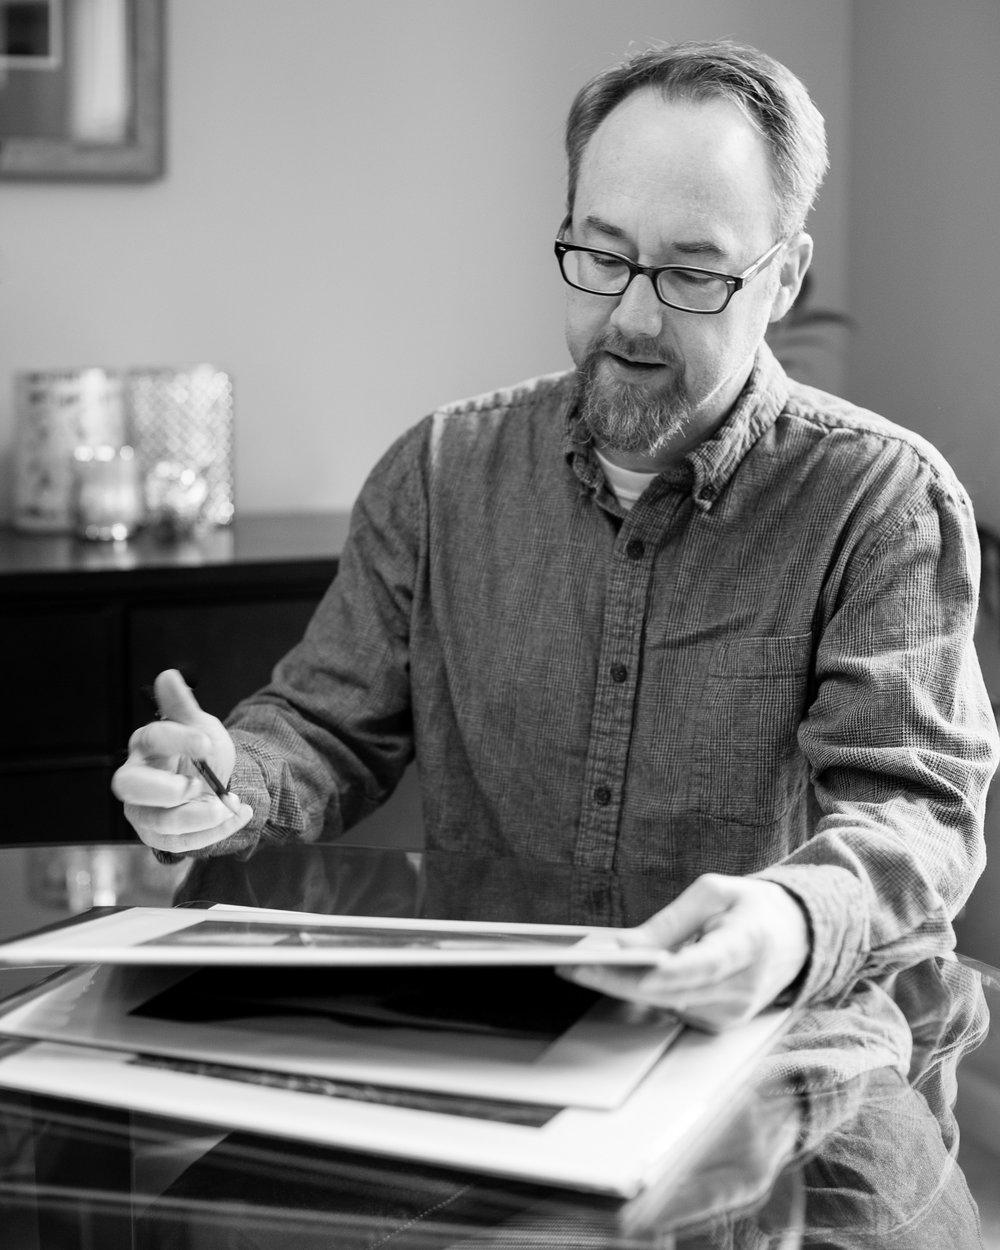 Portrait of Austin Granger, seated